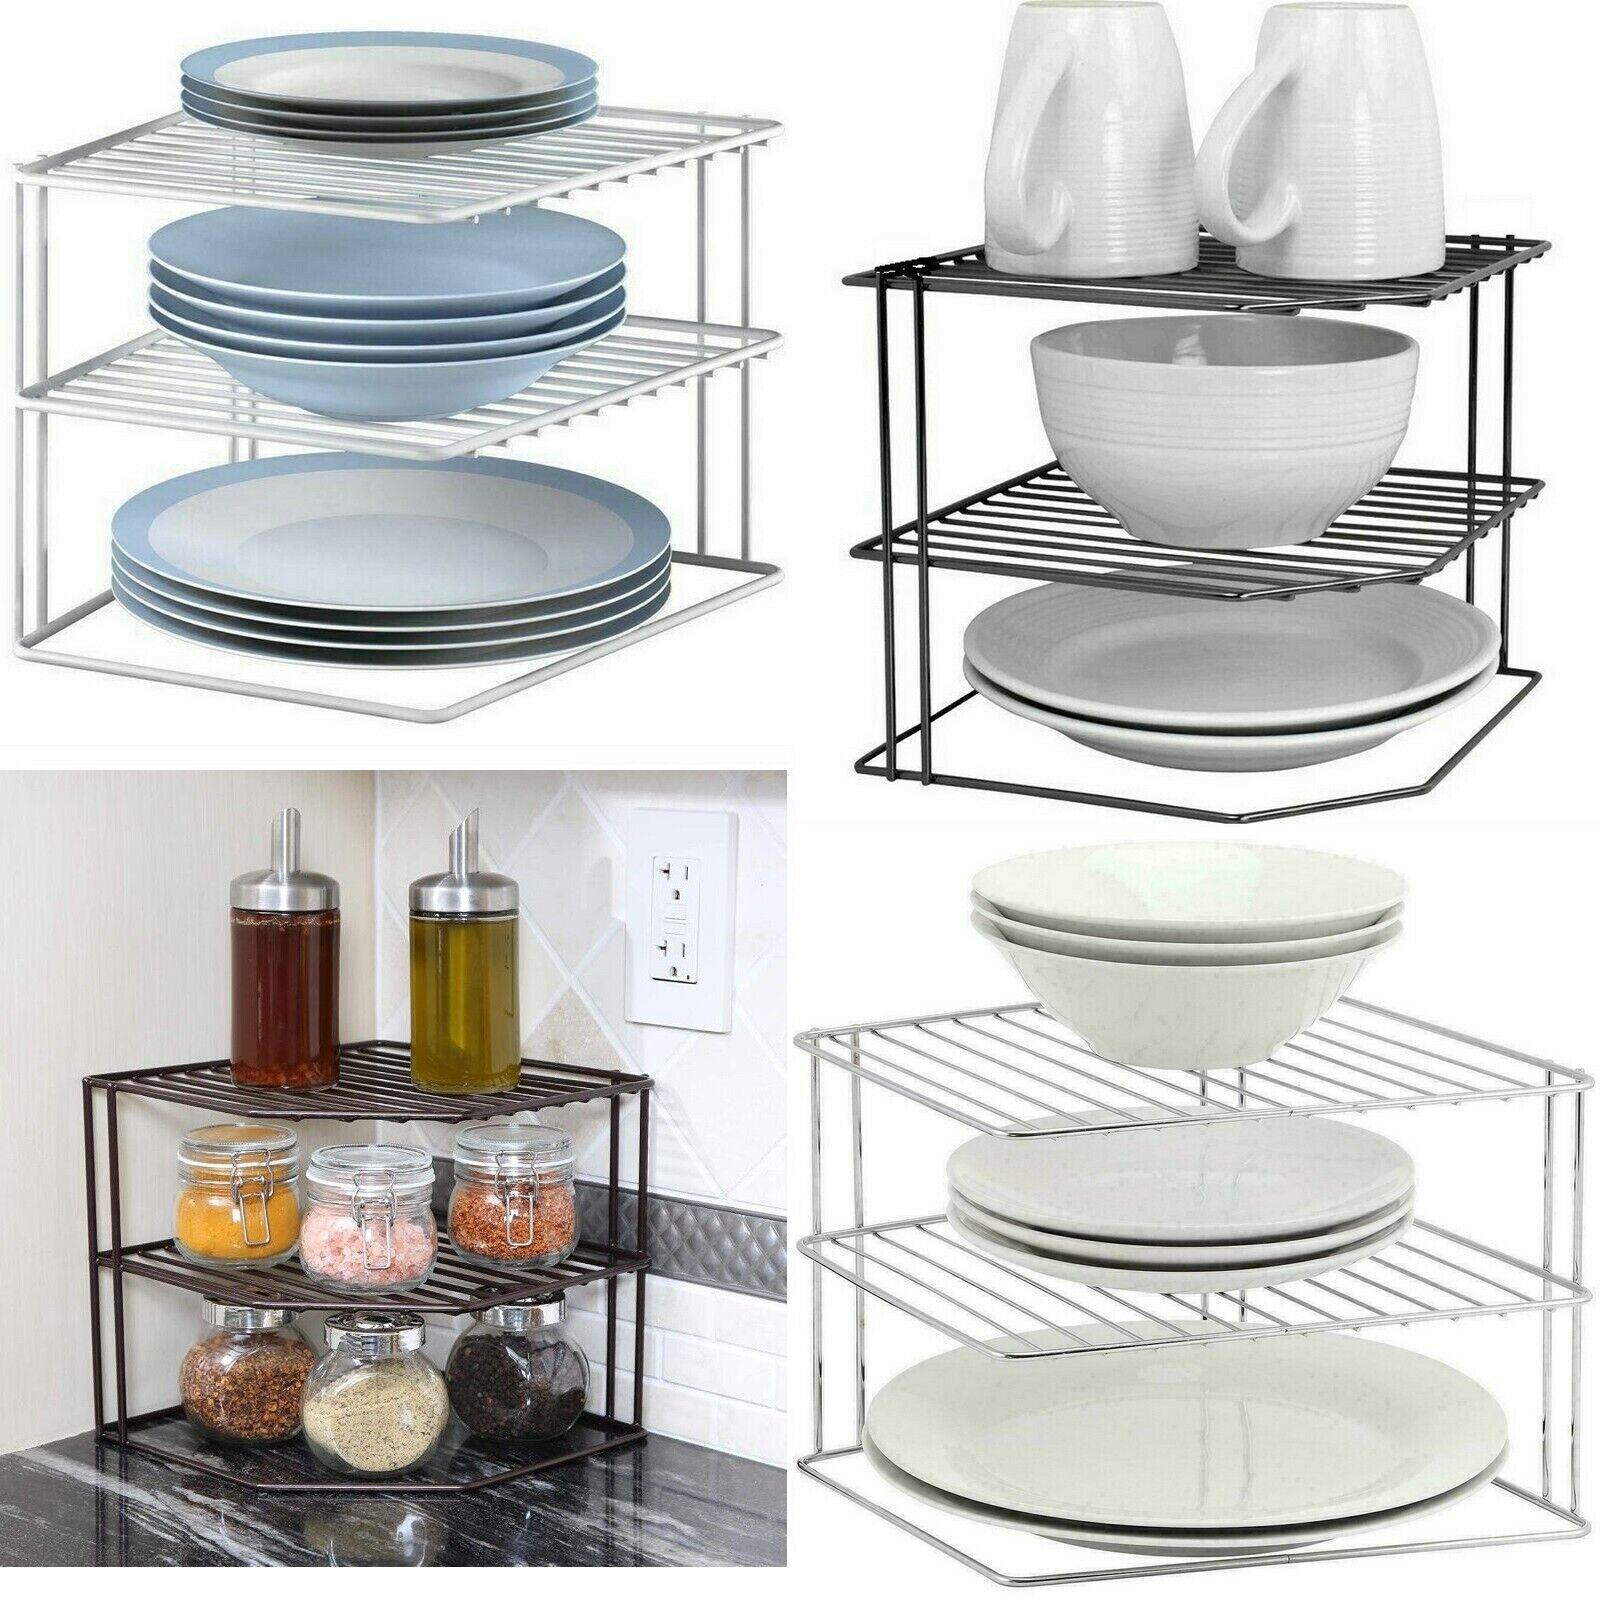 Gk Plate Storage Rack For Cupboard White Corner Kitchen Stand Holder Organiser S For Sale Ebay